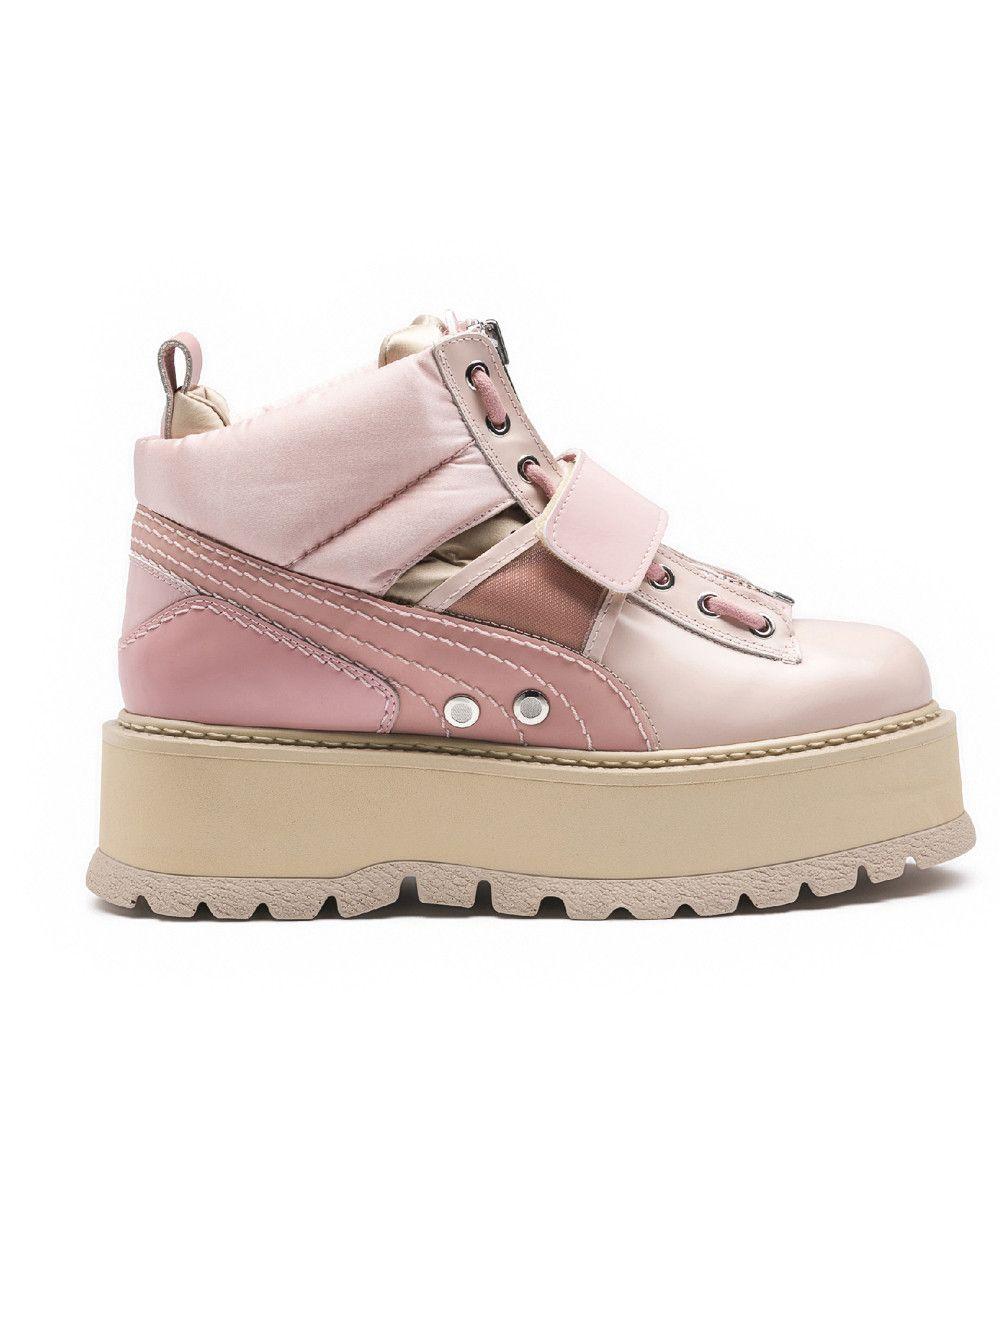 ae0ec9be28e2 Pink  Fenty X Puma By Rihanna  Sneaker Boots